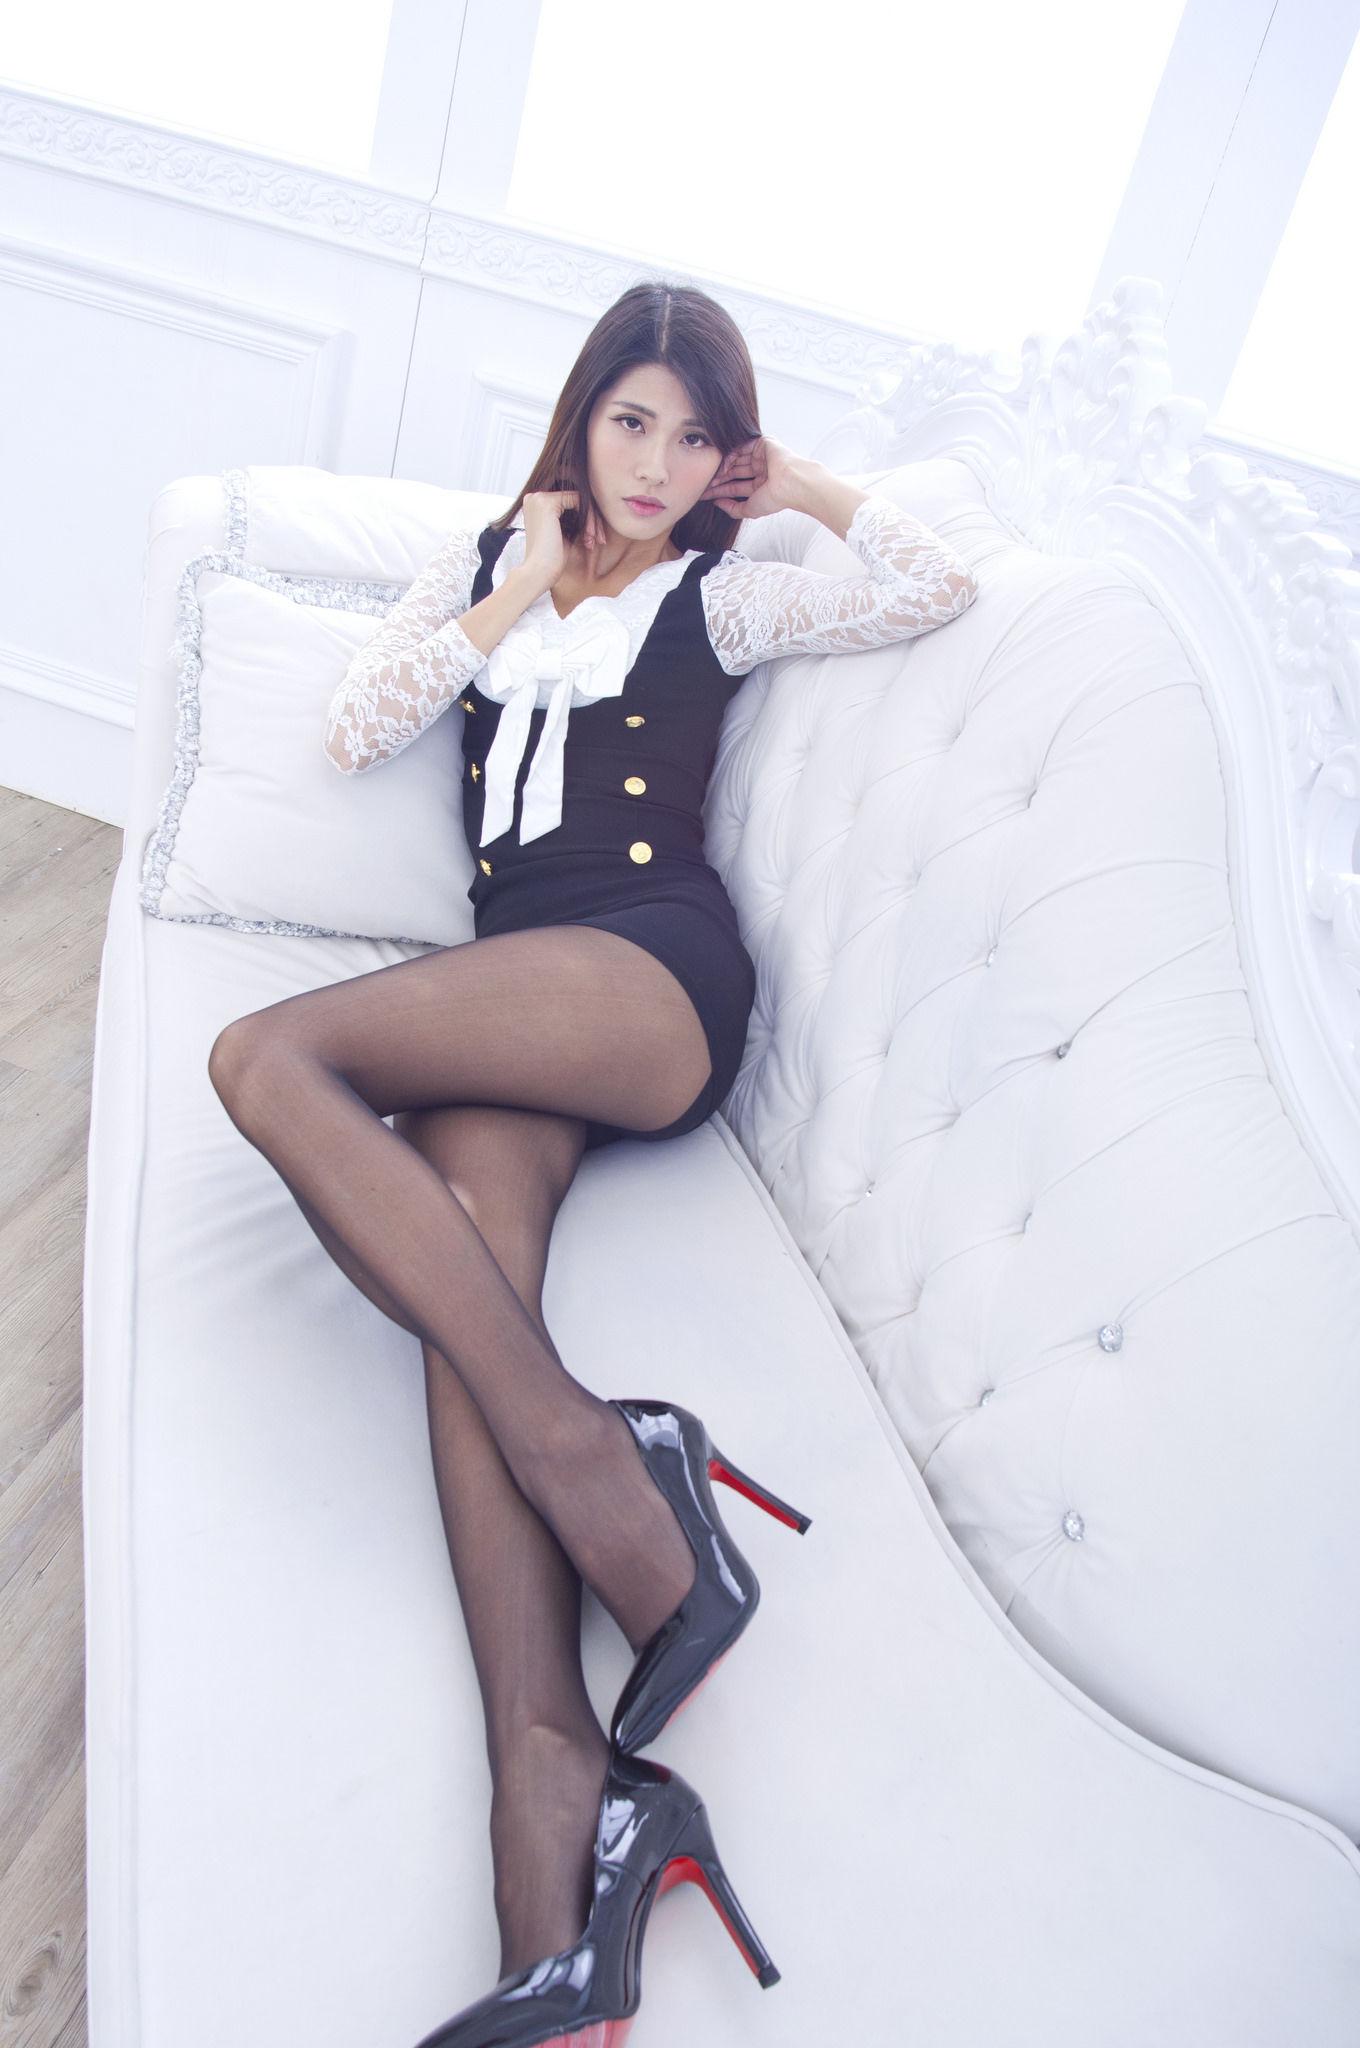 VOL.1349 [台湾正妹]黑丝长腿美女:林沐沐(Joanna沐沐)超高清个人性感漂亮大图(38P)